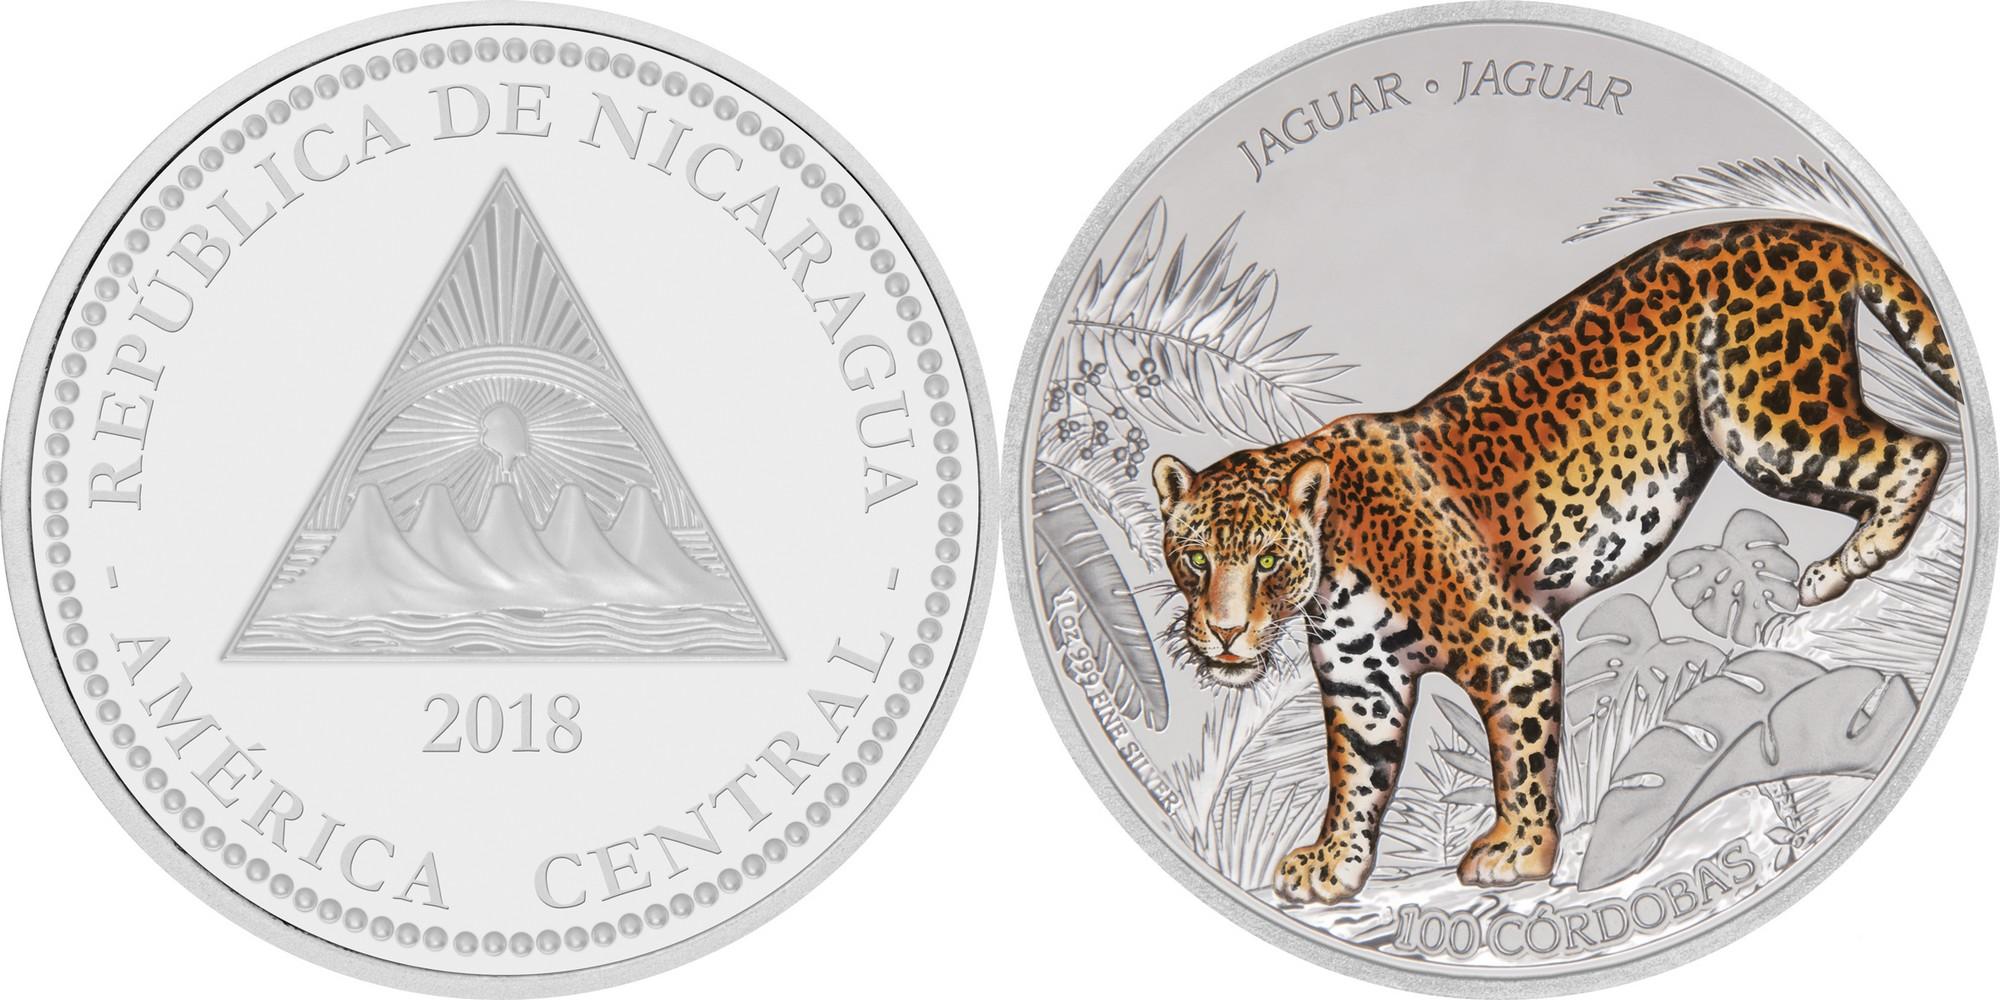 nicaragua 2018 jaguar